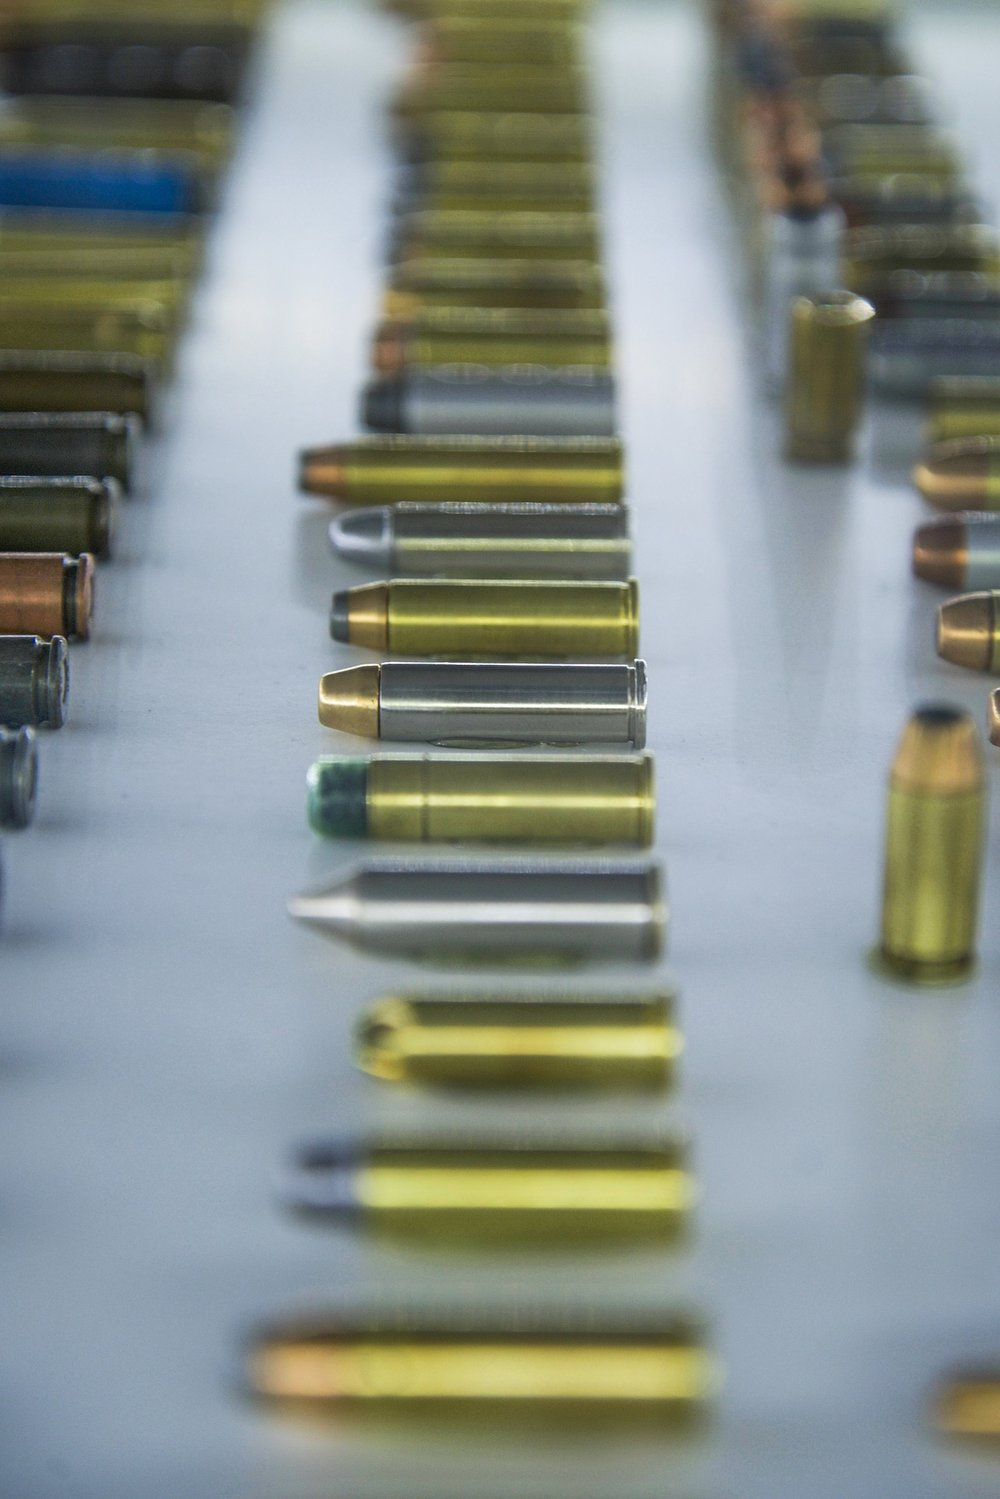 bullet-1784137_1920.jpg